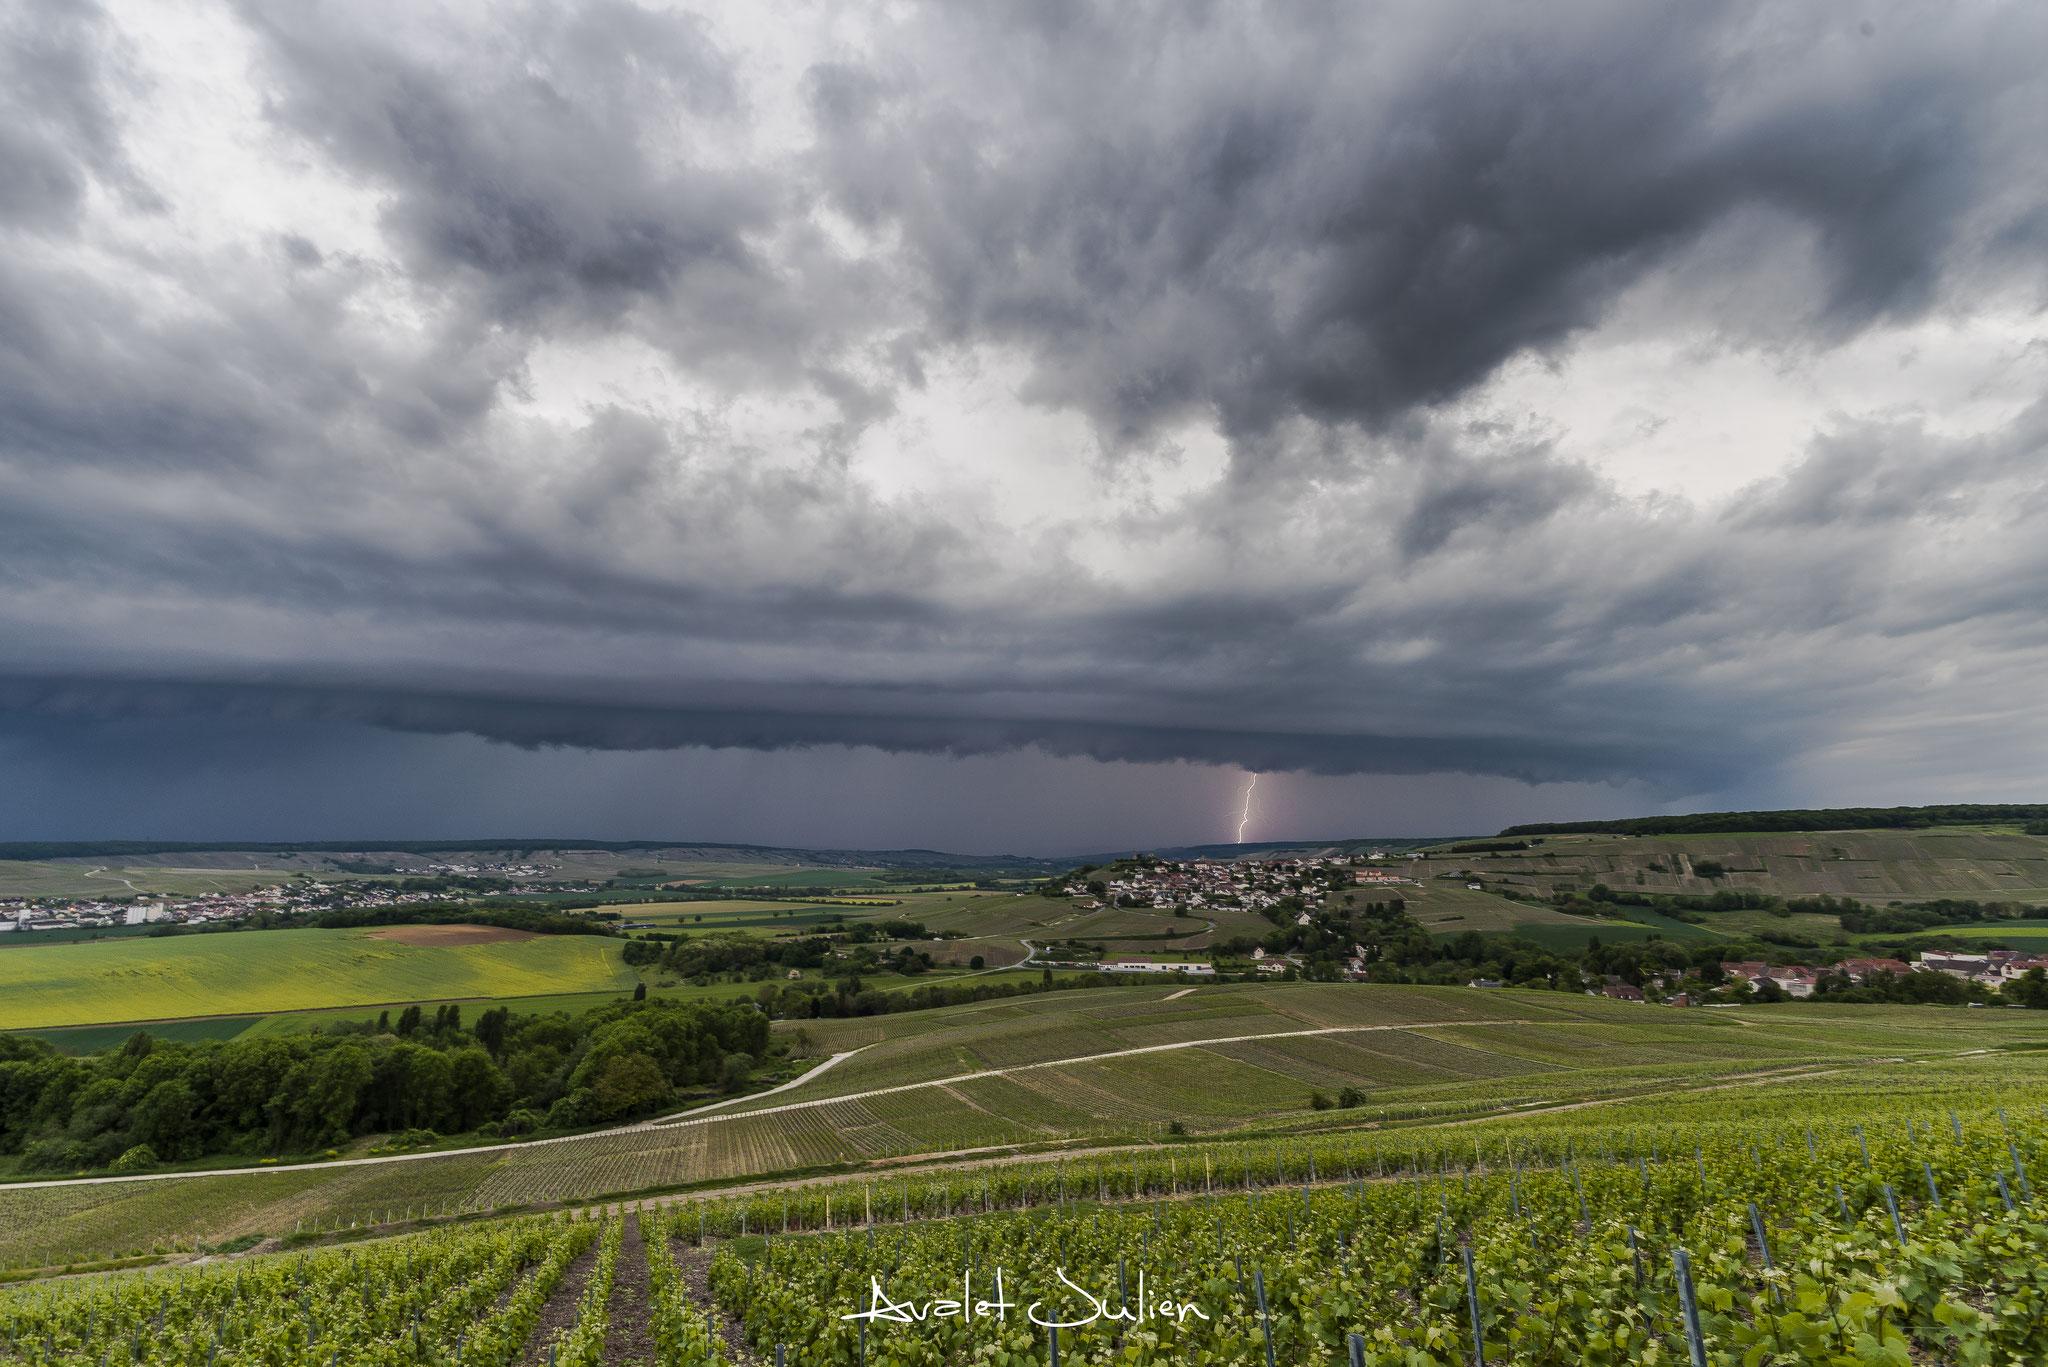 Arcus et foudre en Vallée de Marne(51)en 2017